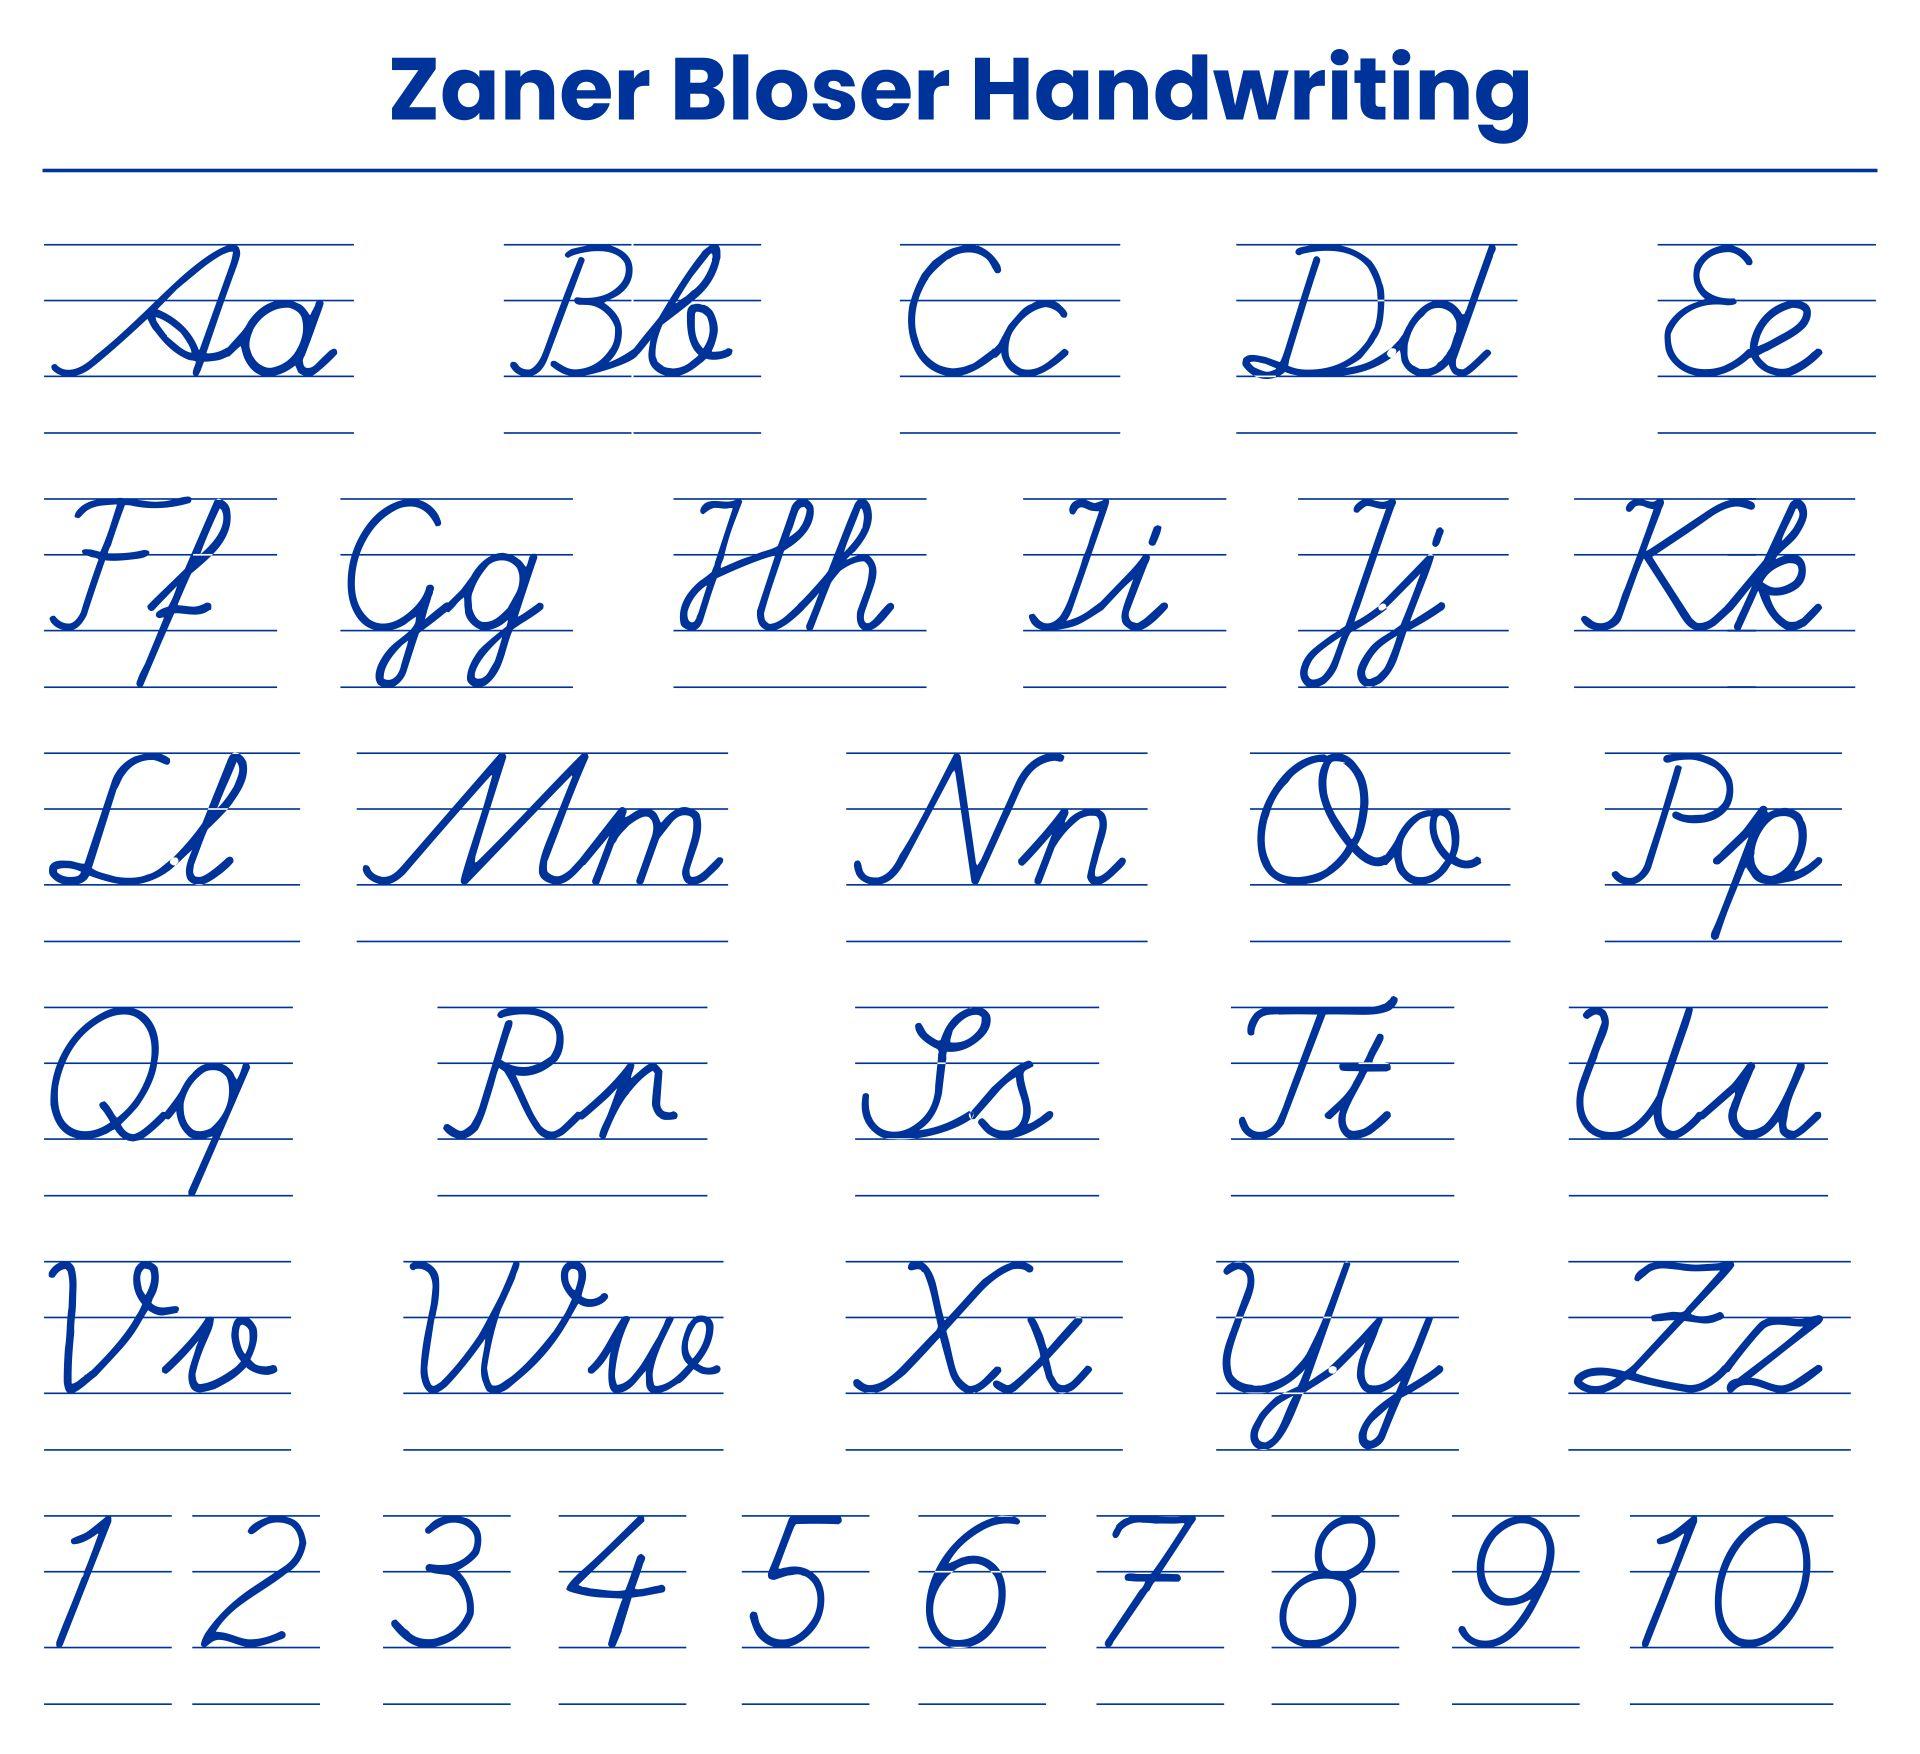 Zaner-Bloser Handwriting Printables